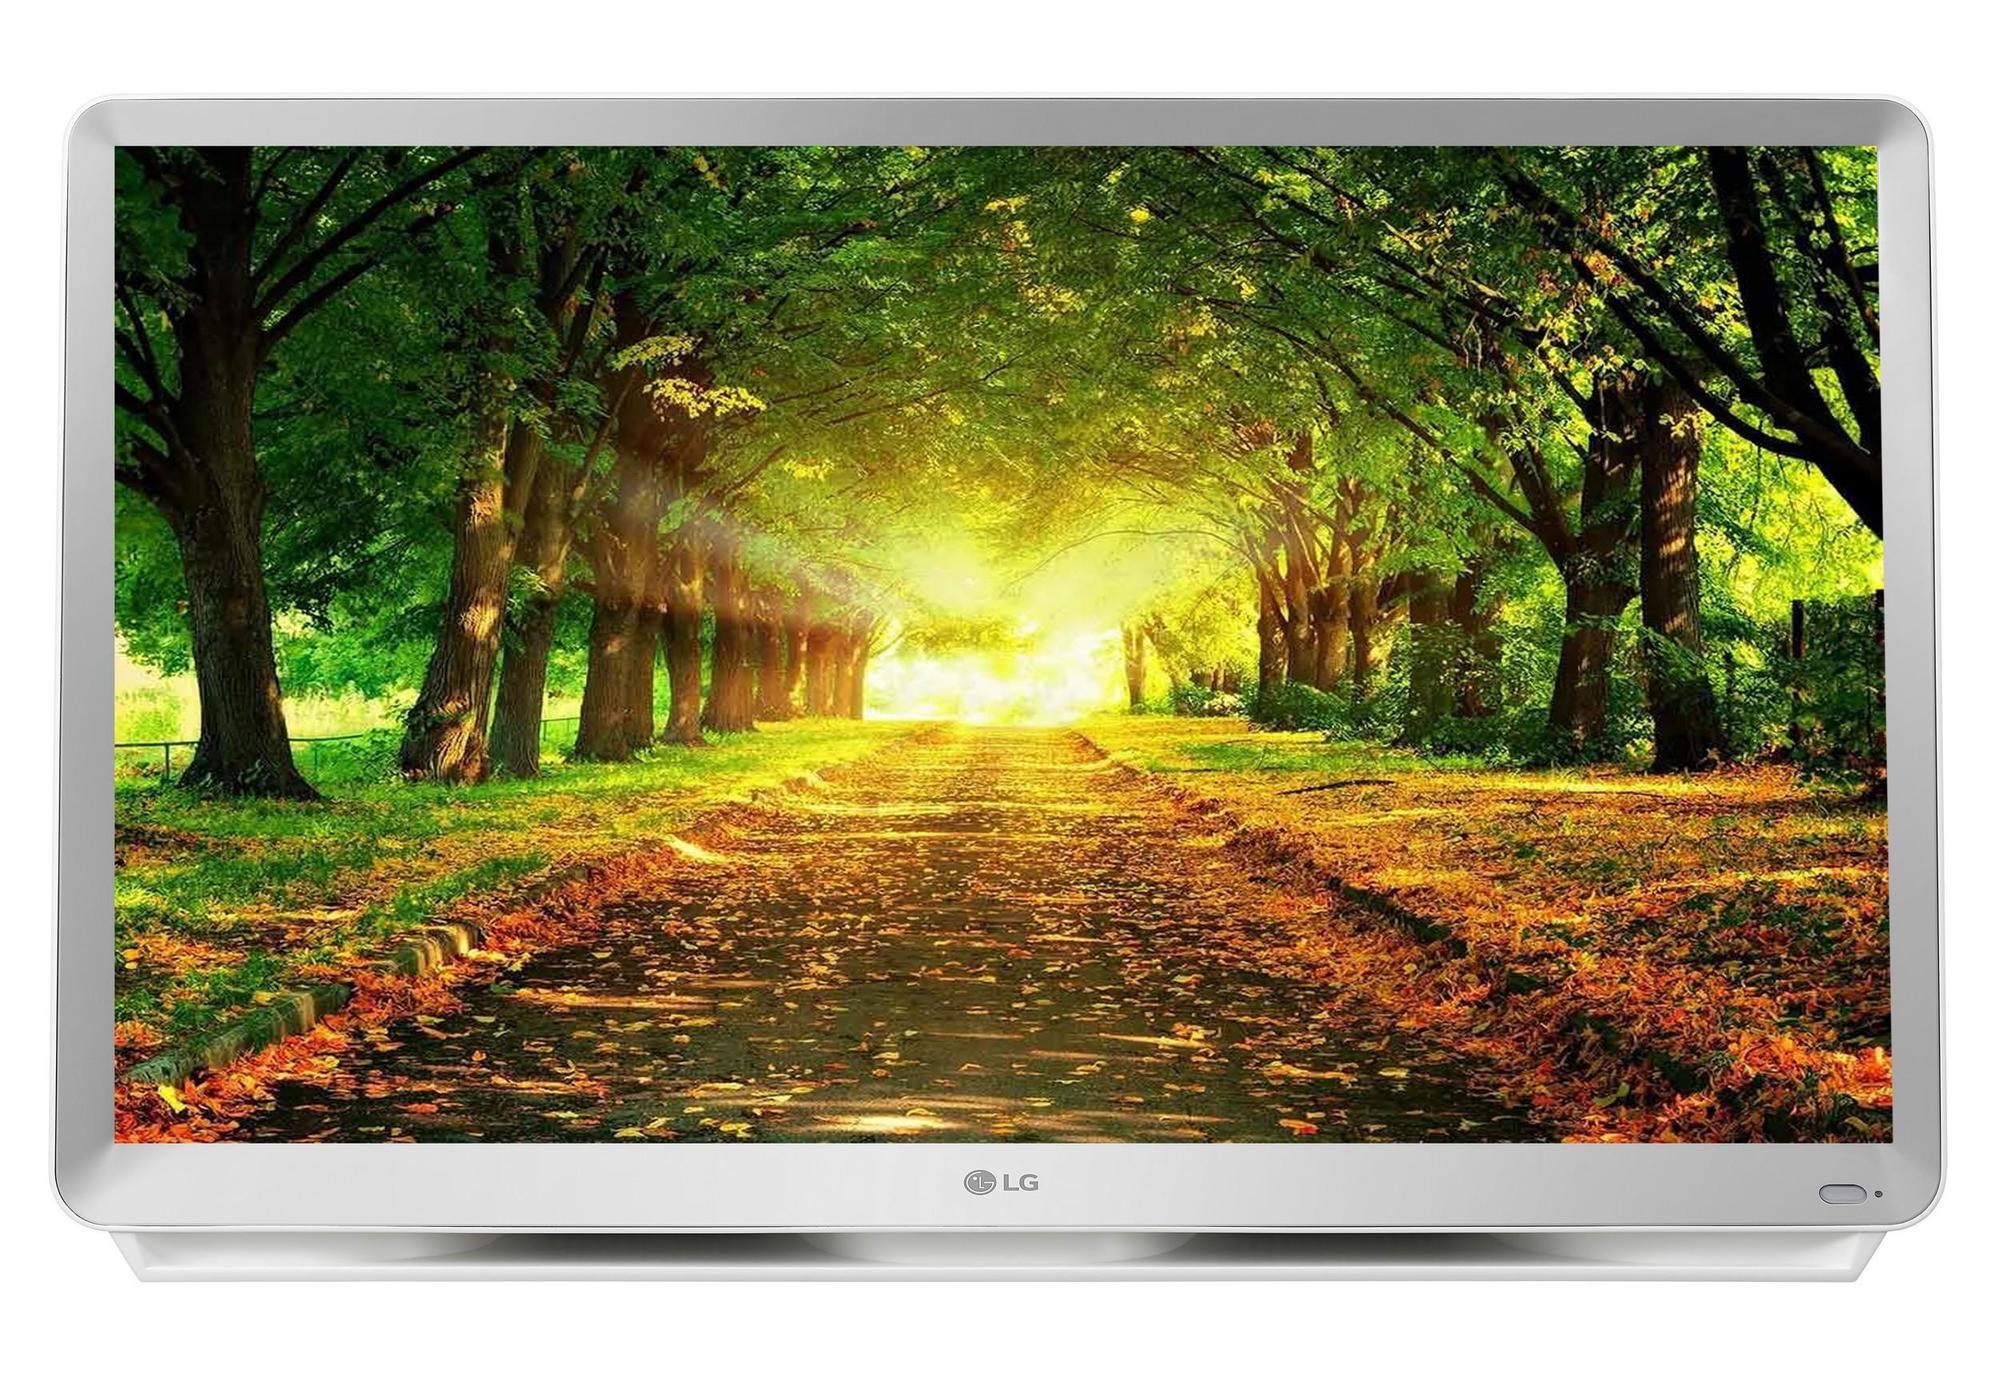 Купить Телевизор LG 27TK600V-WZ, Серый, Россия